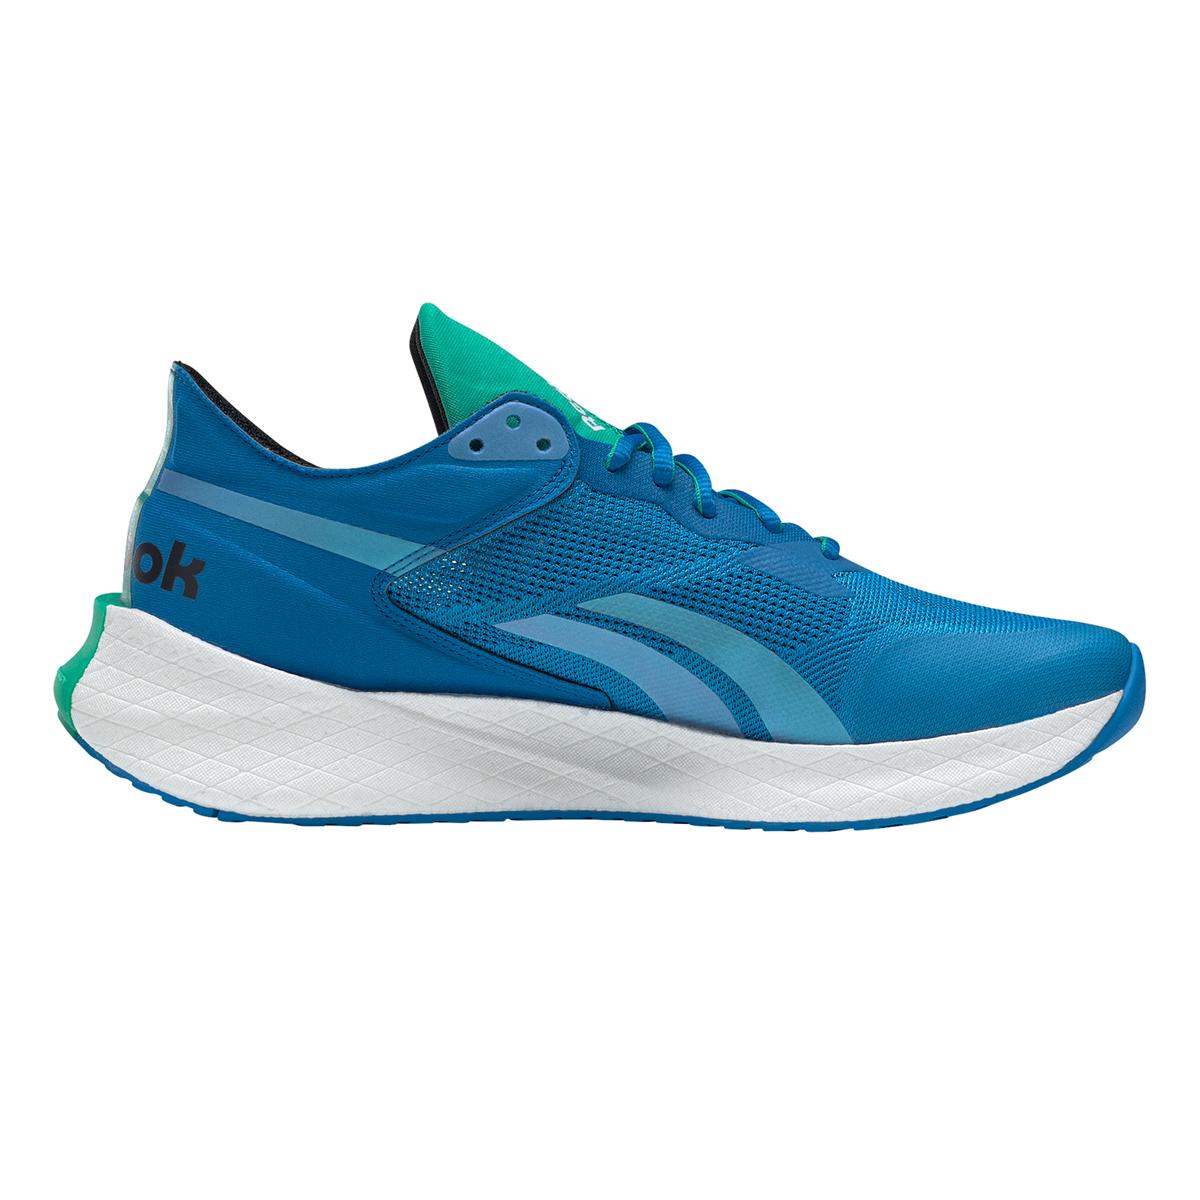 Men's Reebok Floatride Energy Symmetros Running Shoe - Color: Dynamic Blue/Horizon Blue/Court Green - Size: 7 - Width: Regular, Dynamic Blue/Horizon Blue/Court Green, large, image 2